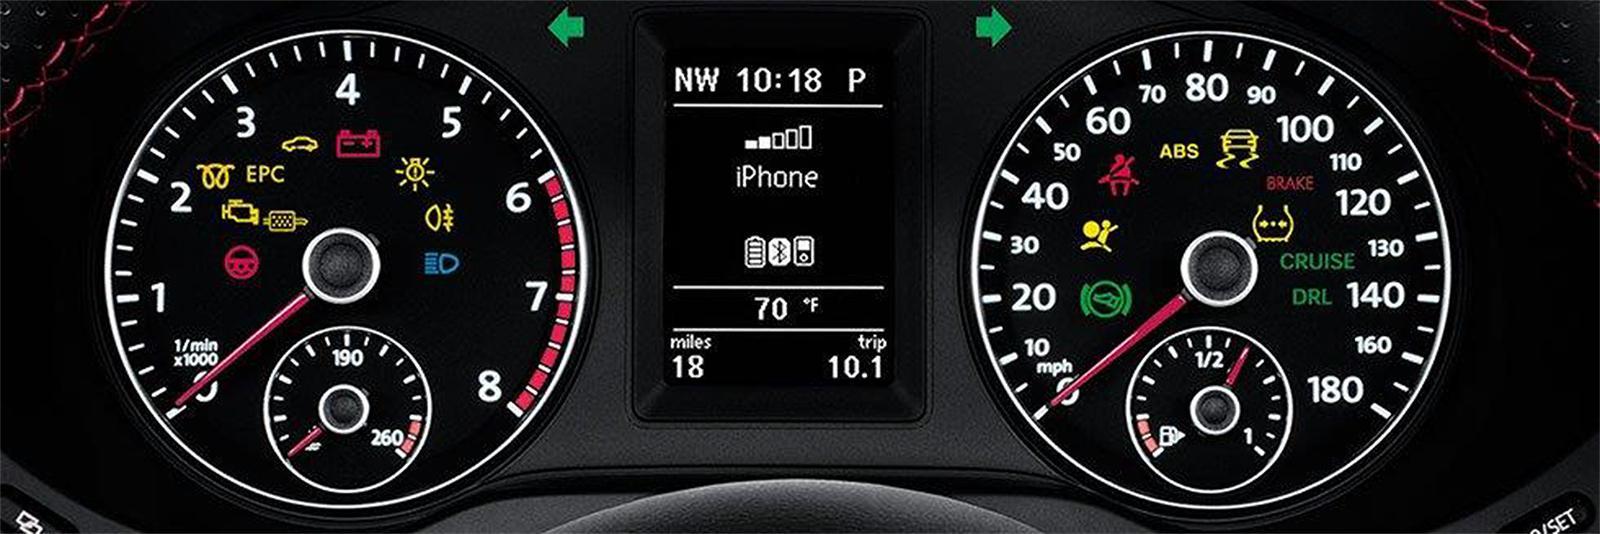 VW dashboard with warning lights illuminated